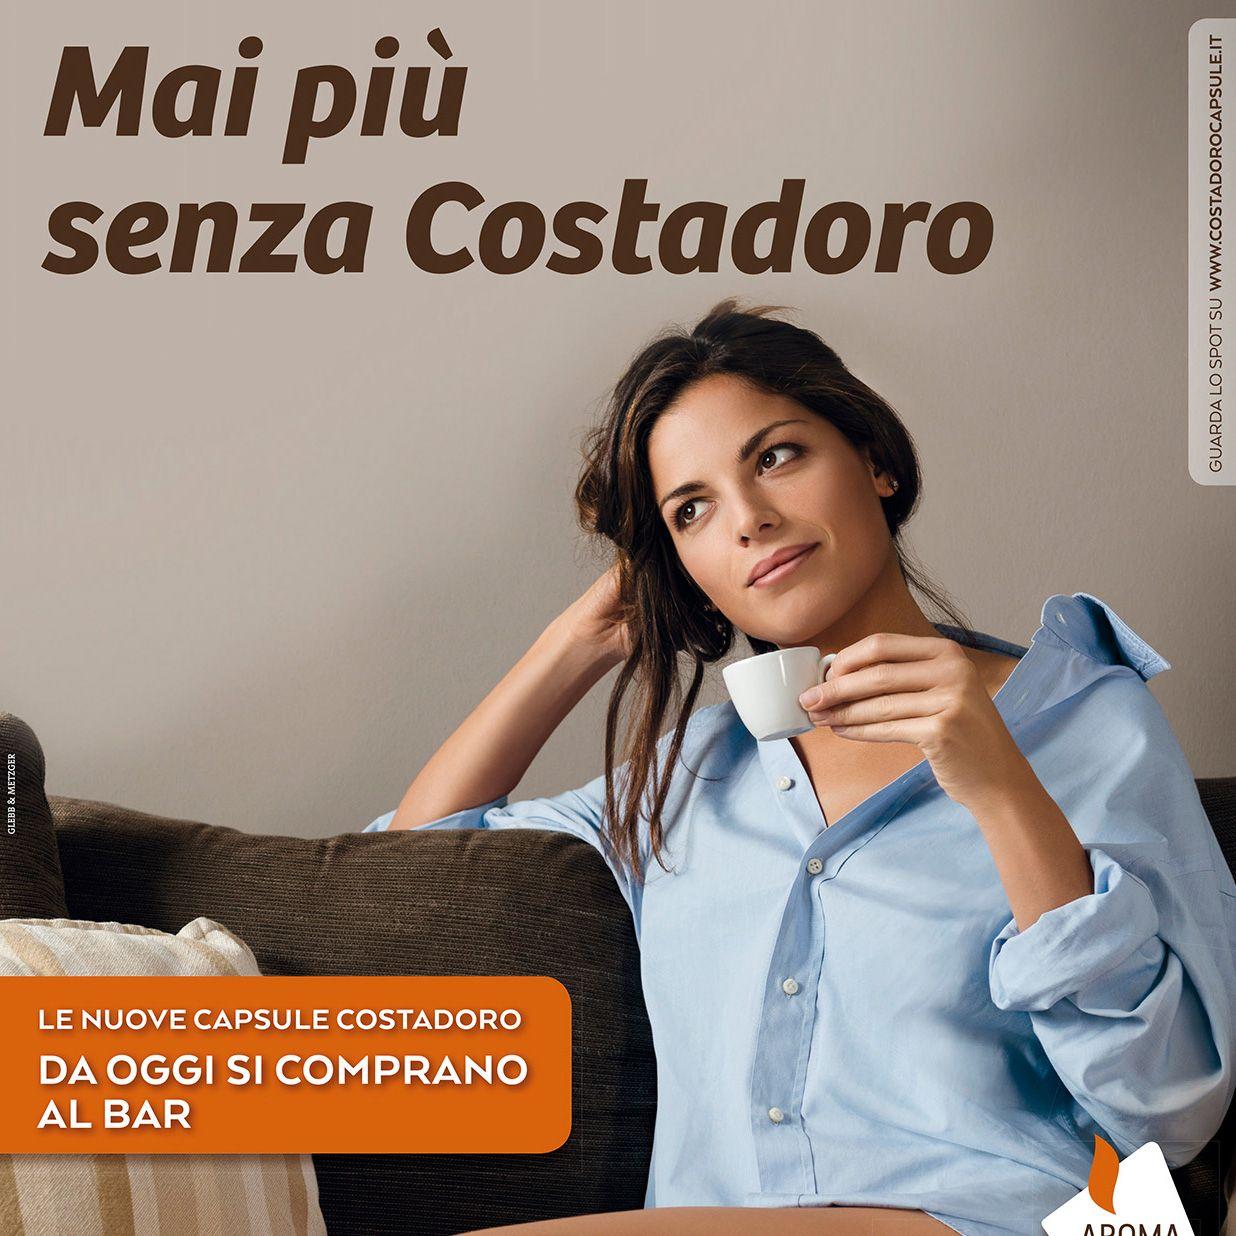 Costadoro Adv